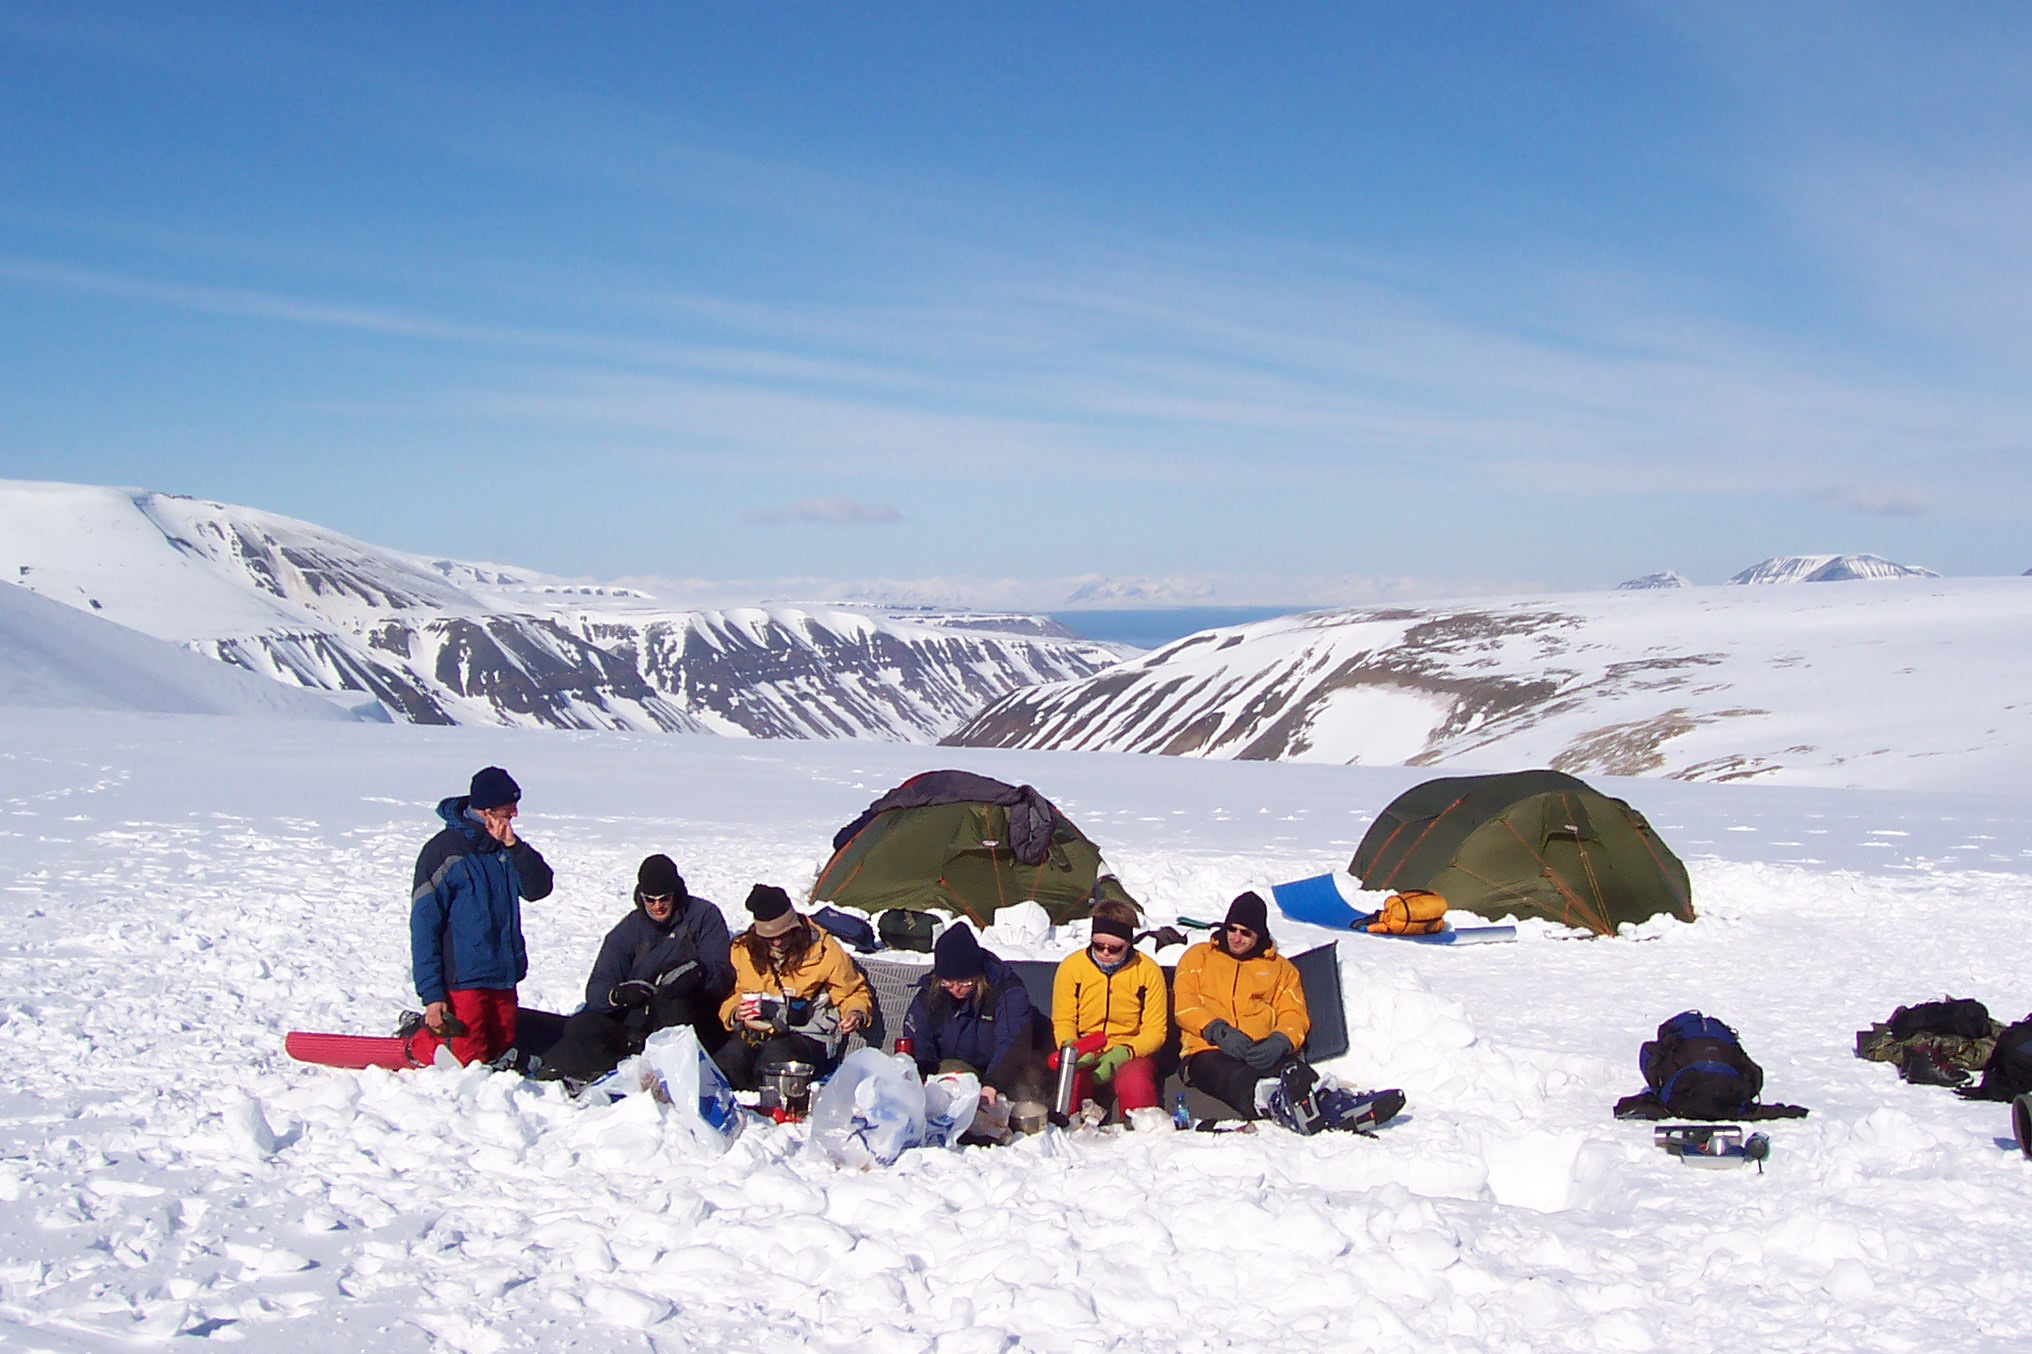 breakfast, spitsbergen 80 degrees north, Narvik